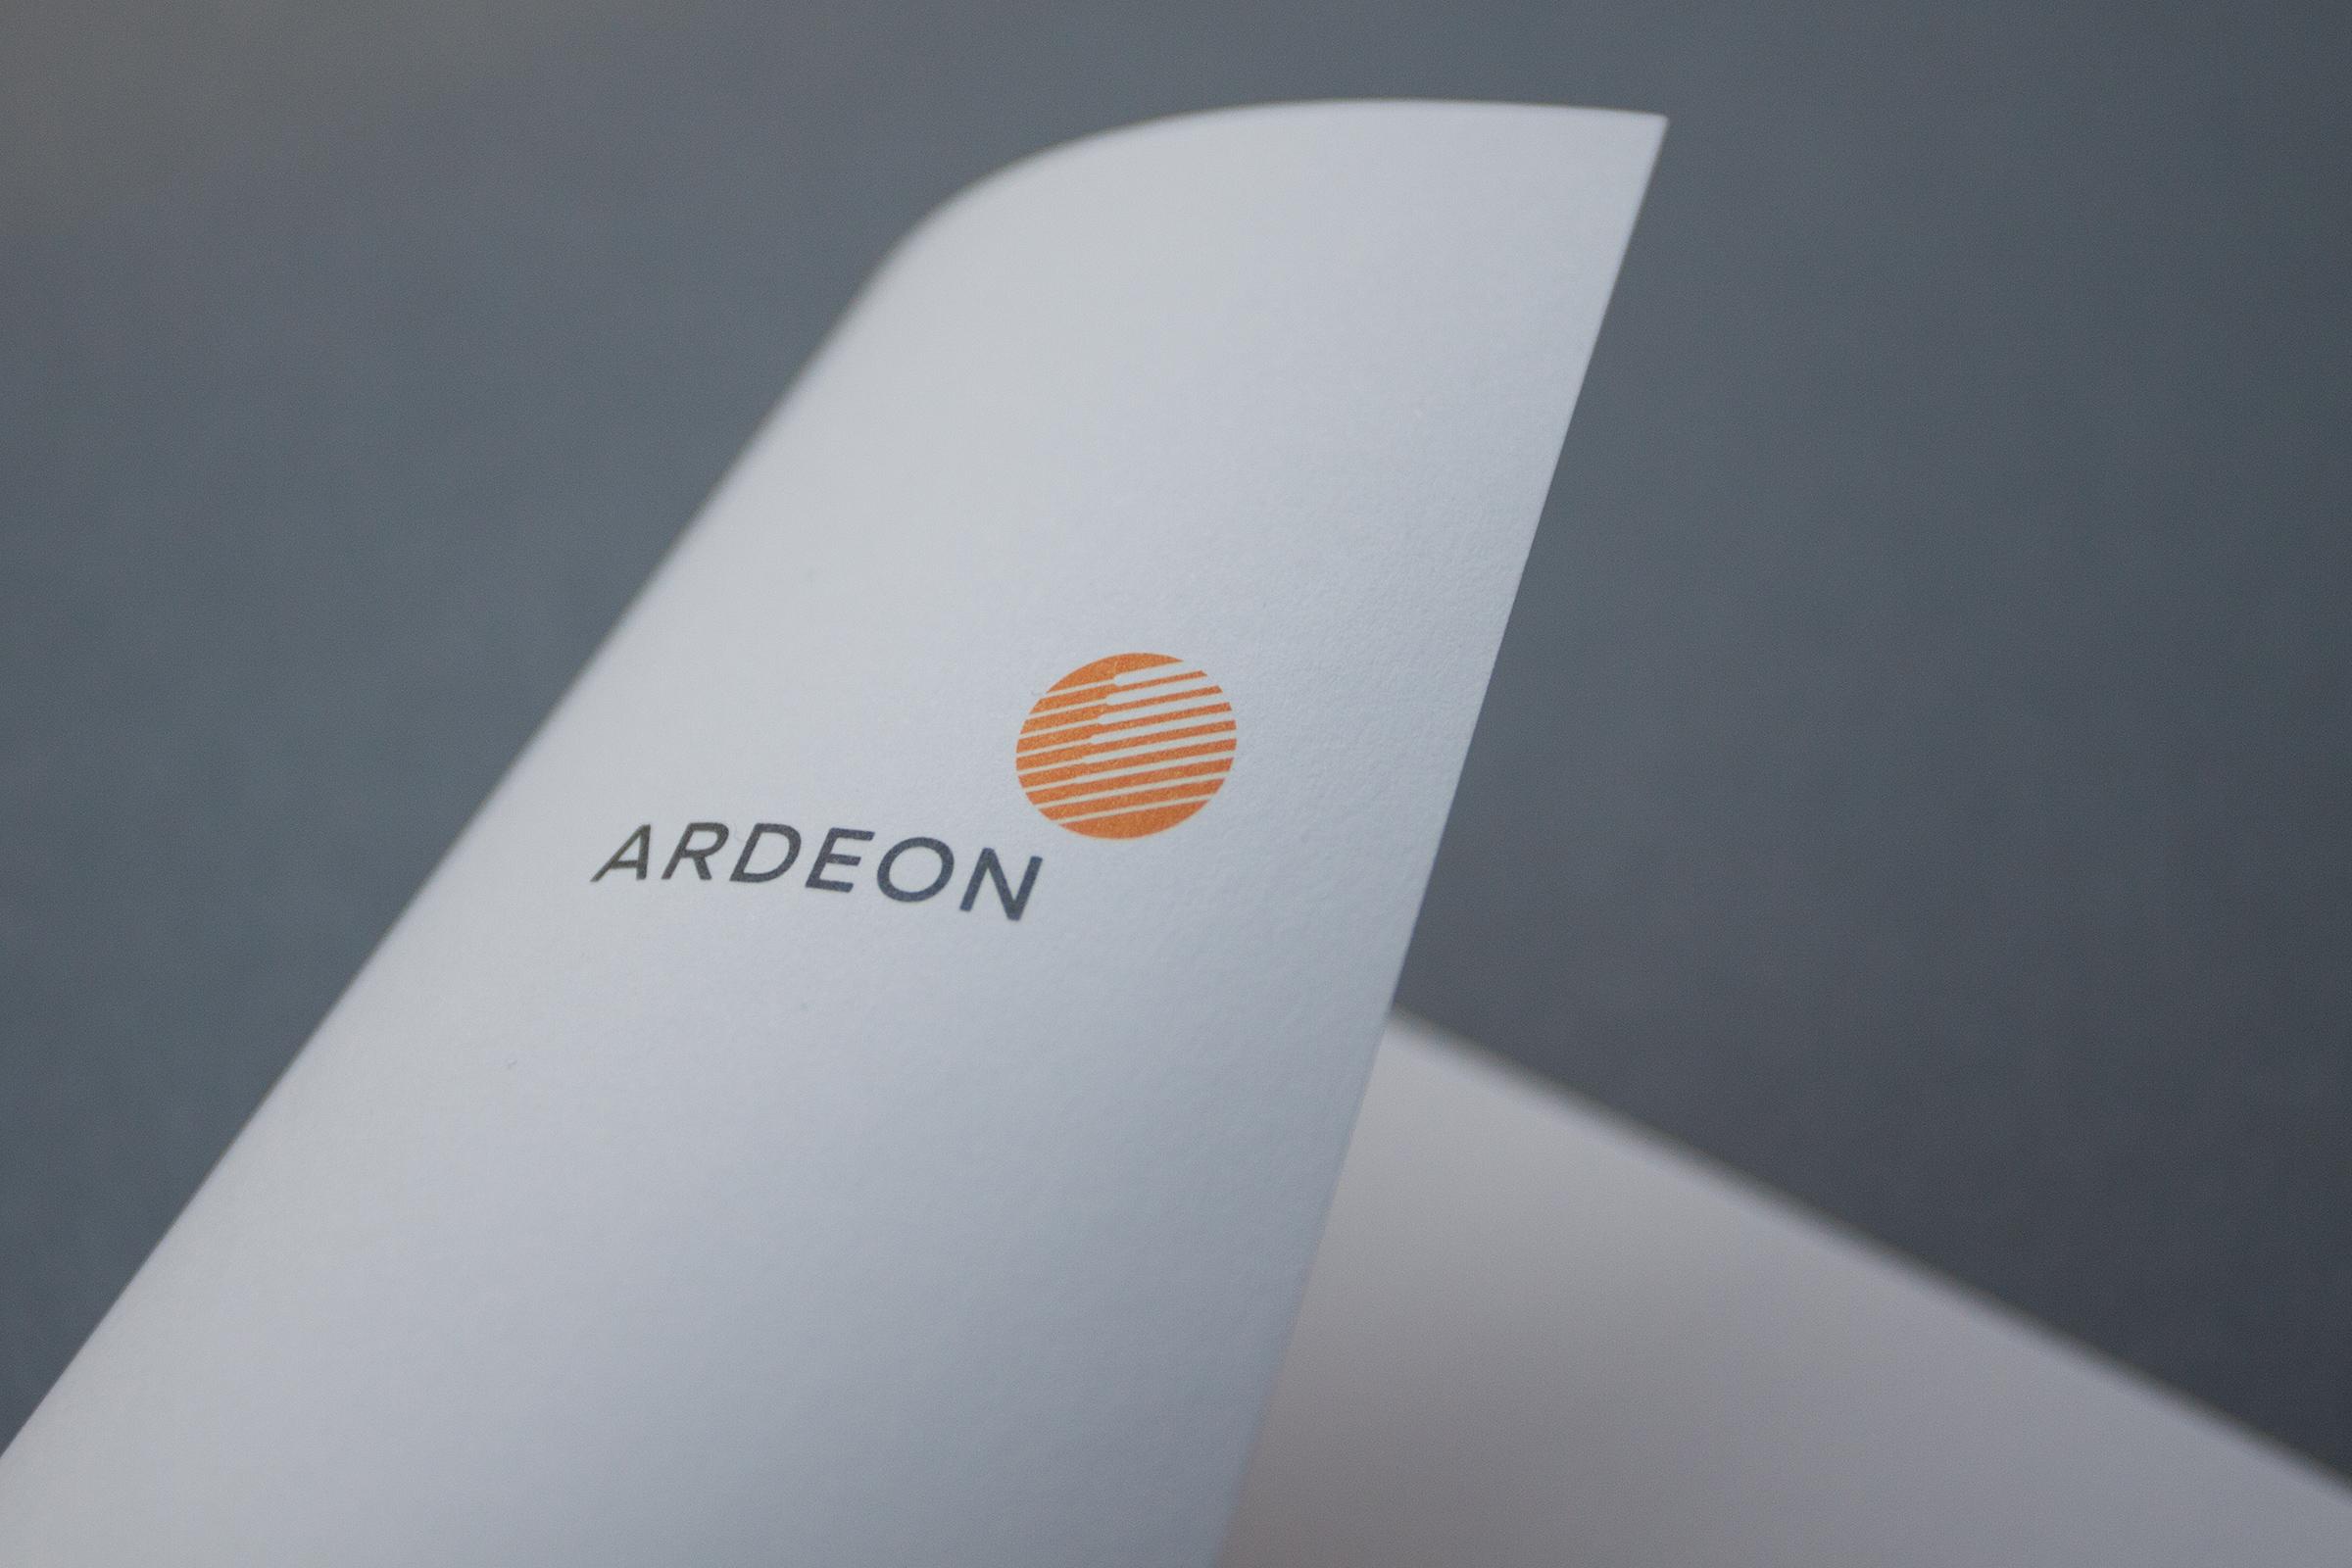 ardeon-bueroink-logo_2982